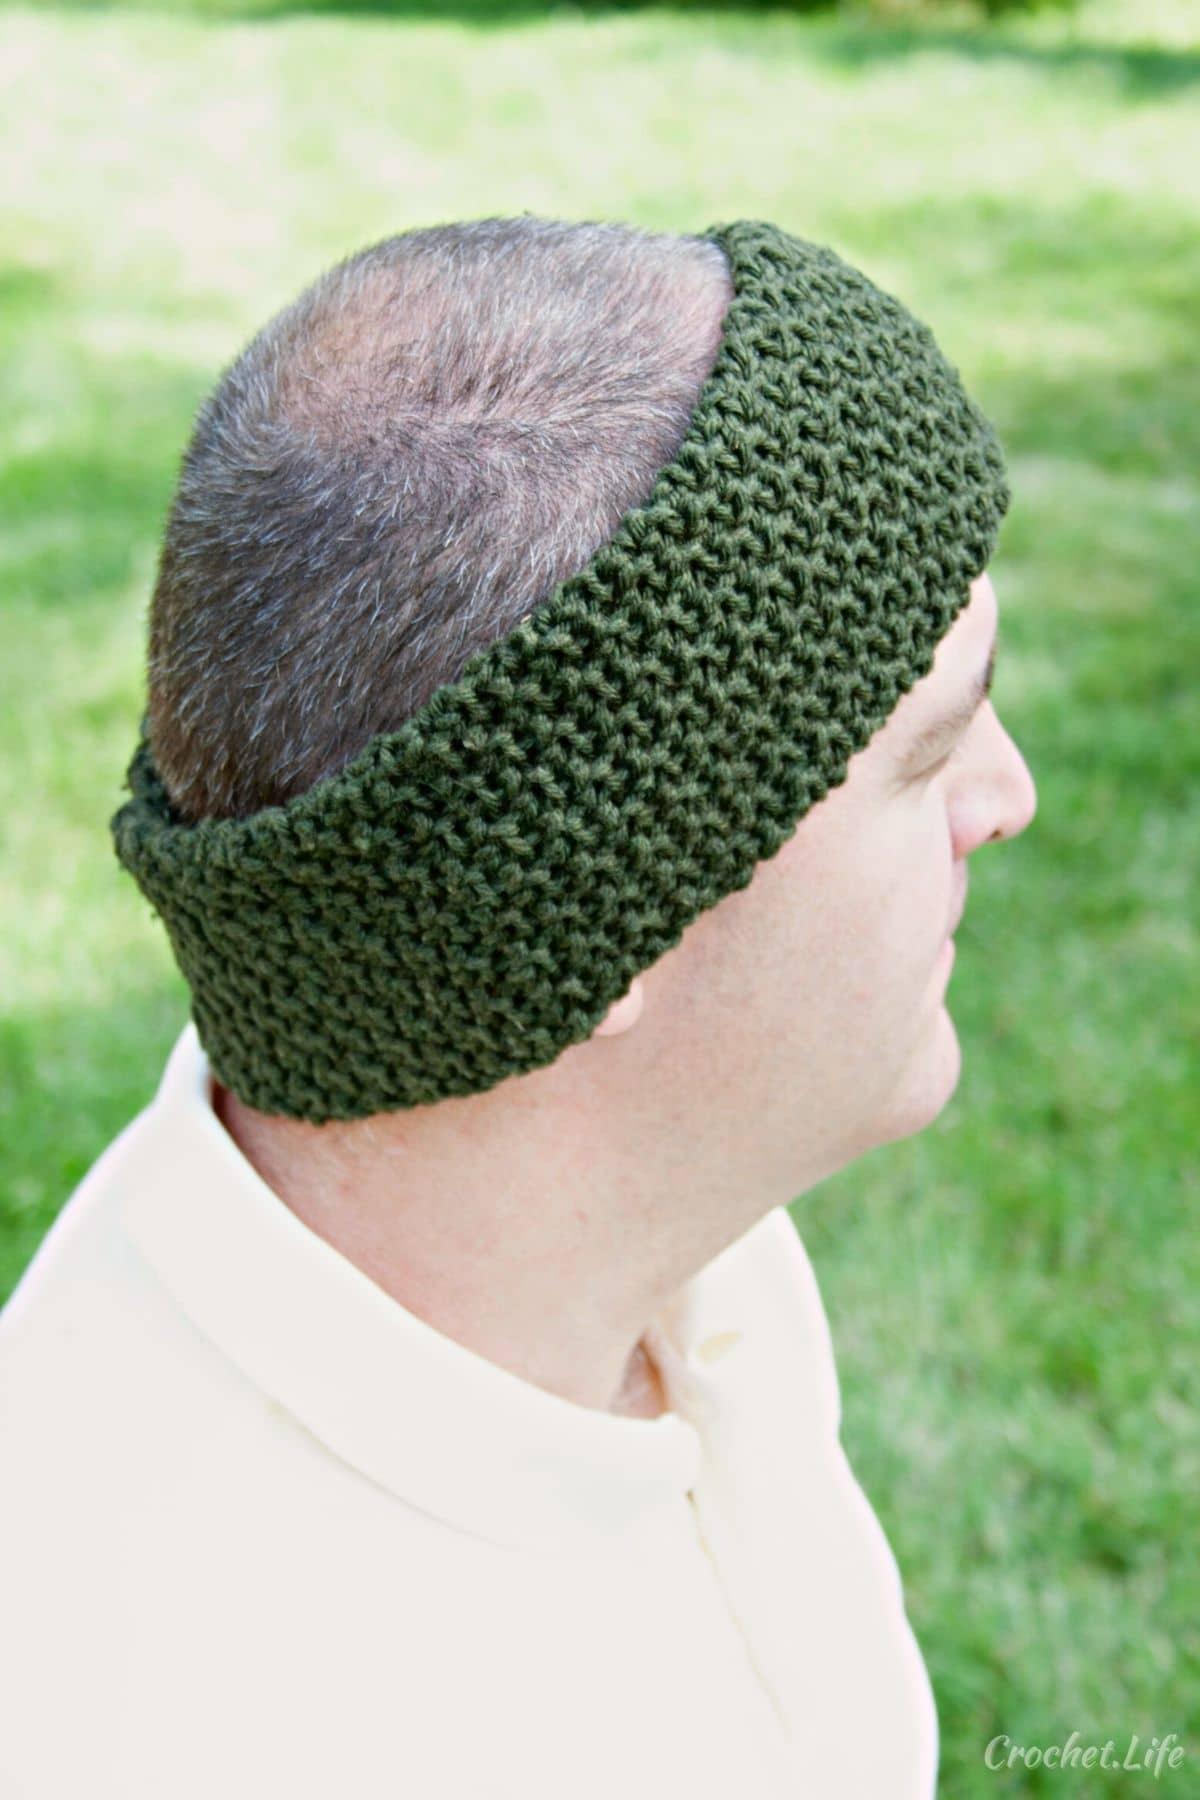 Man in white shirt wearing green crochet headband